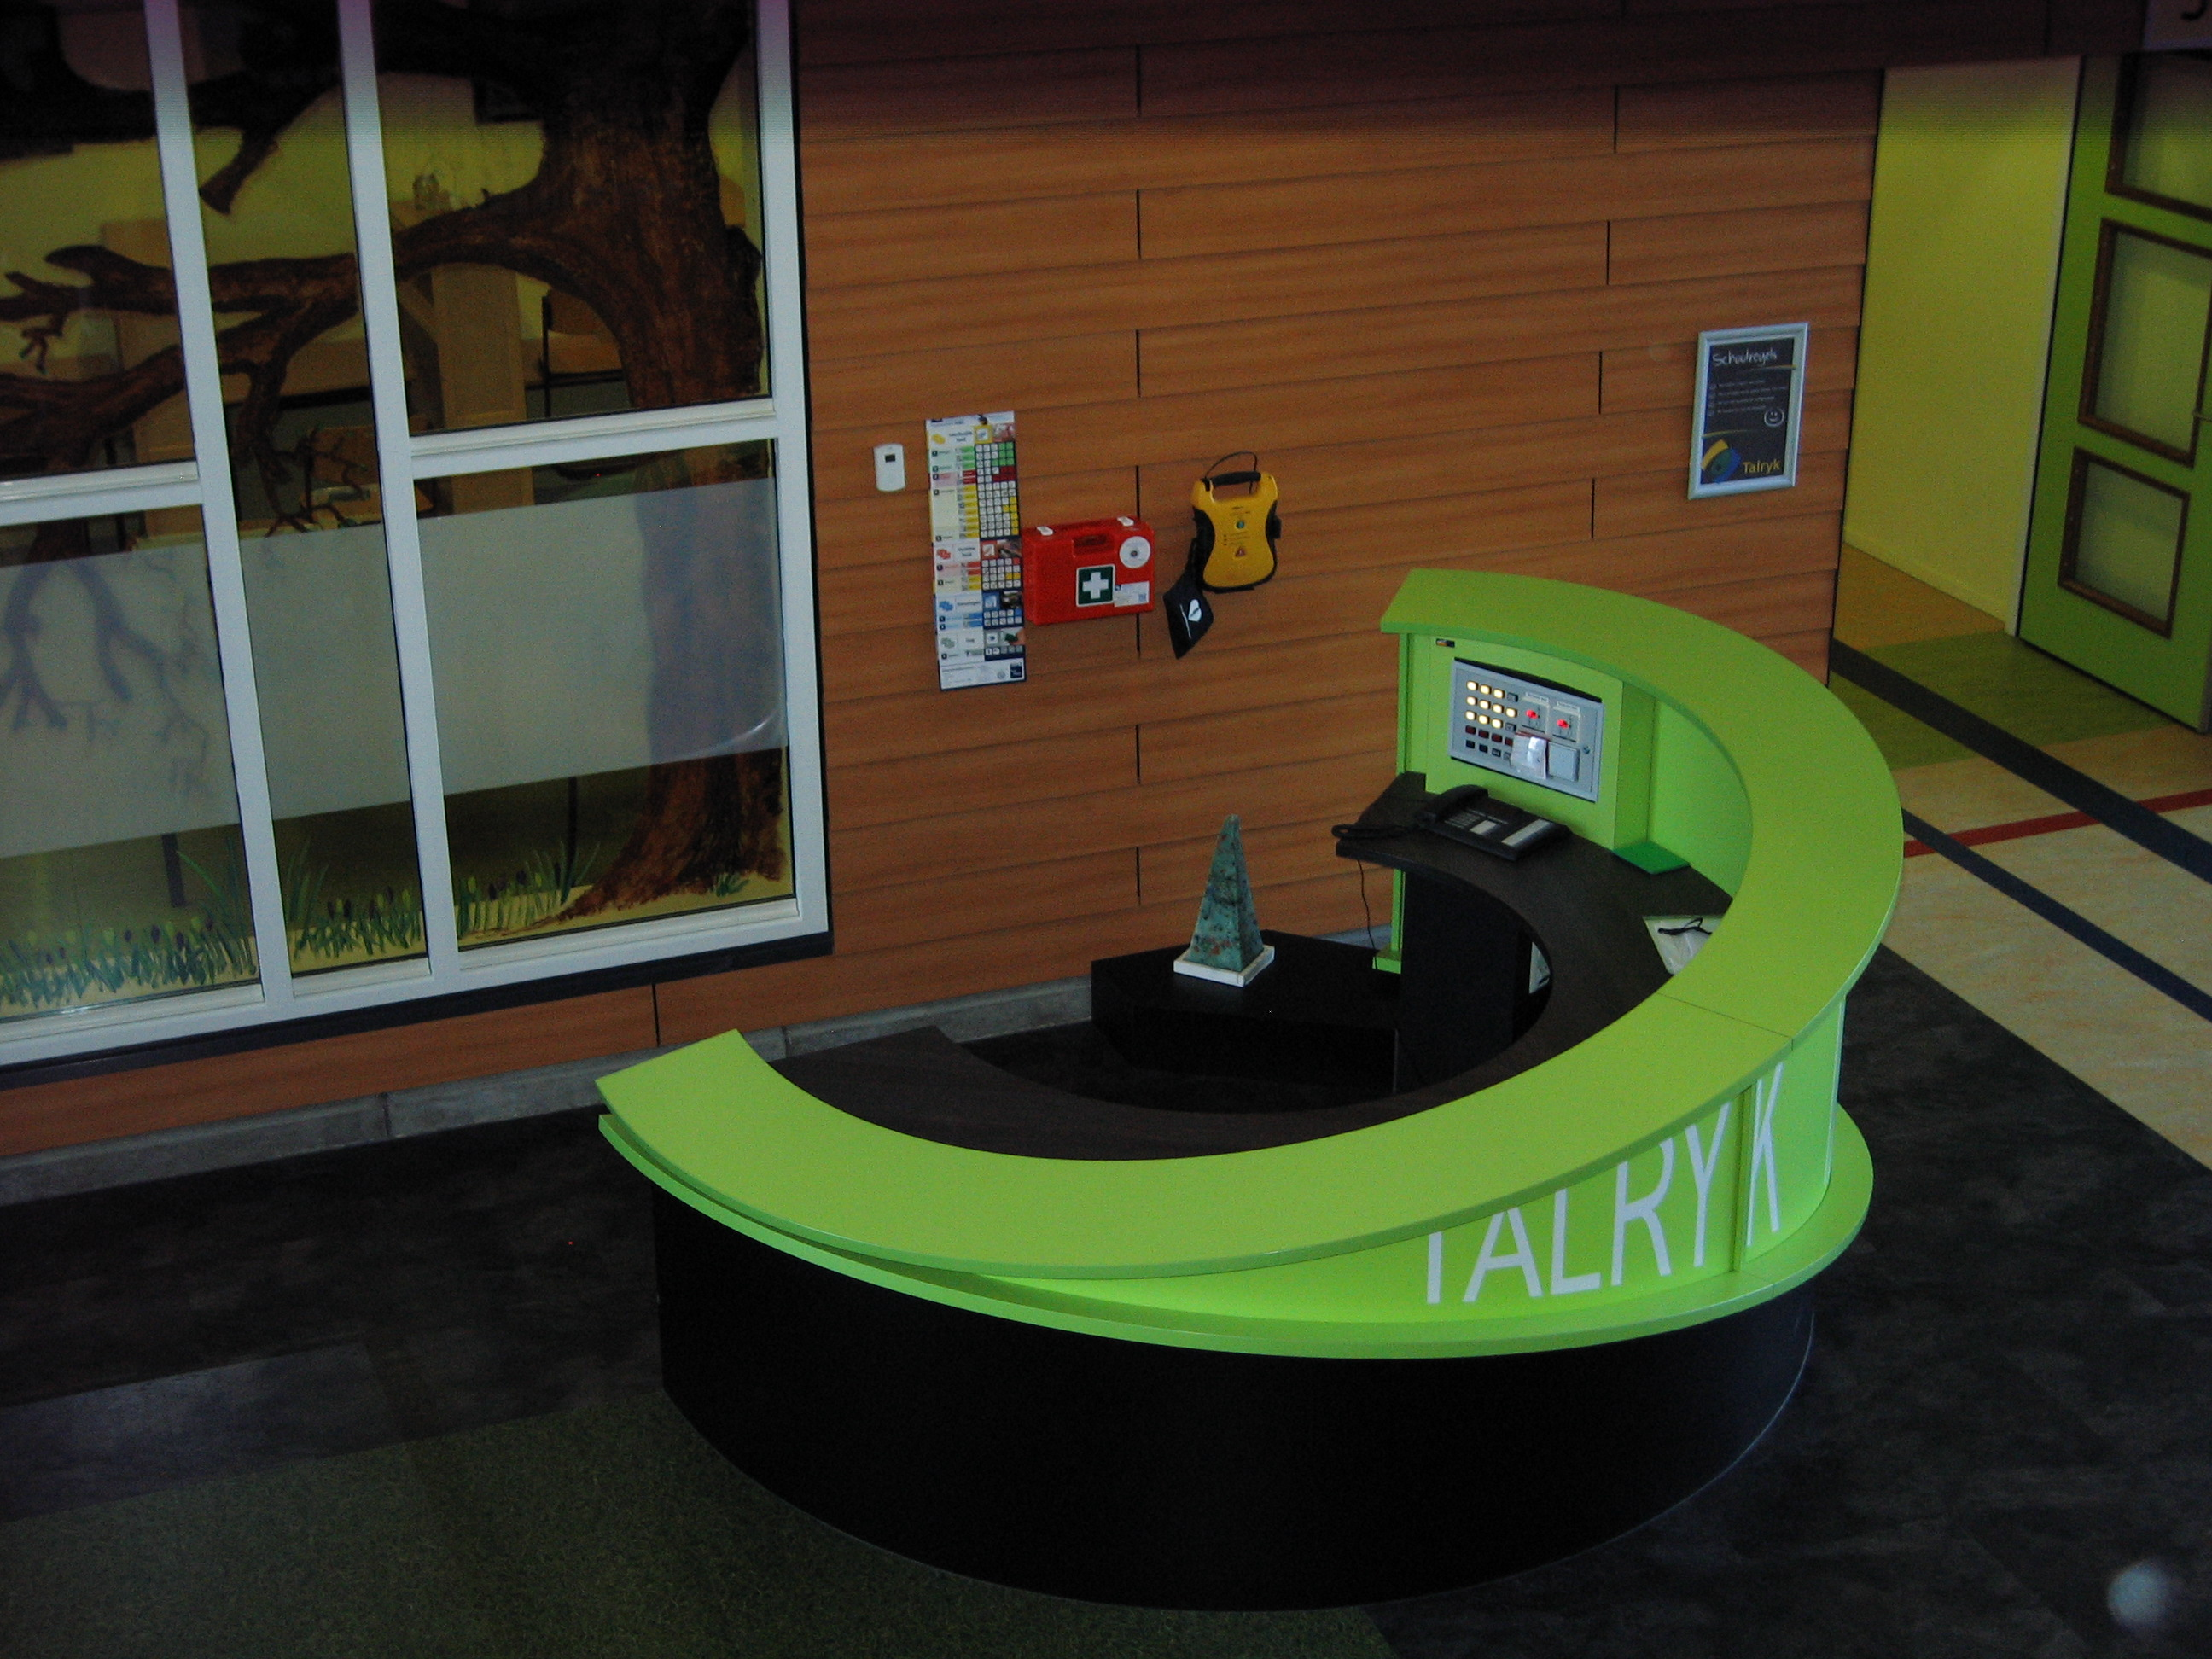 balie-vso-talryk-bovenaanzicht